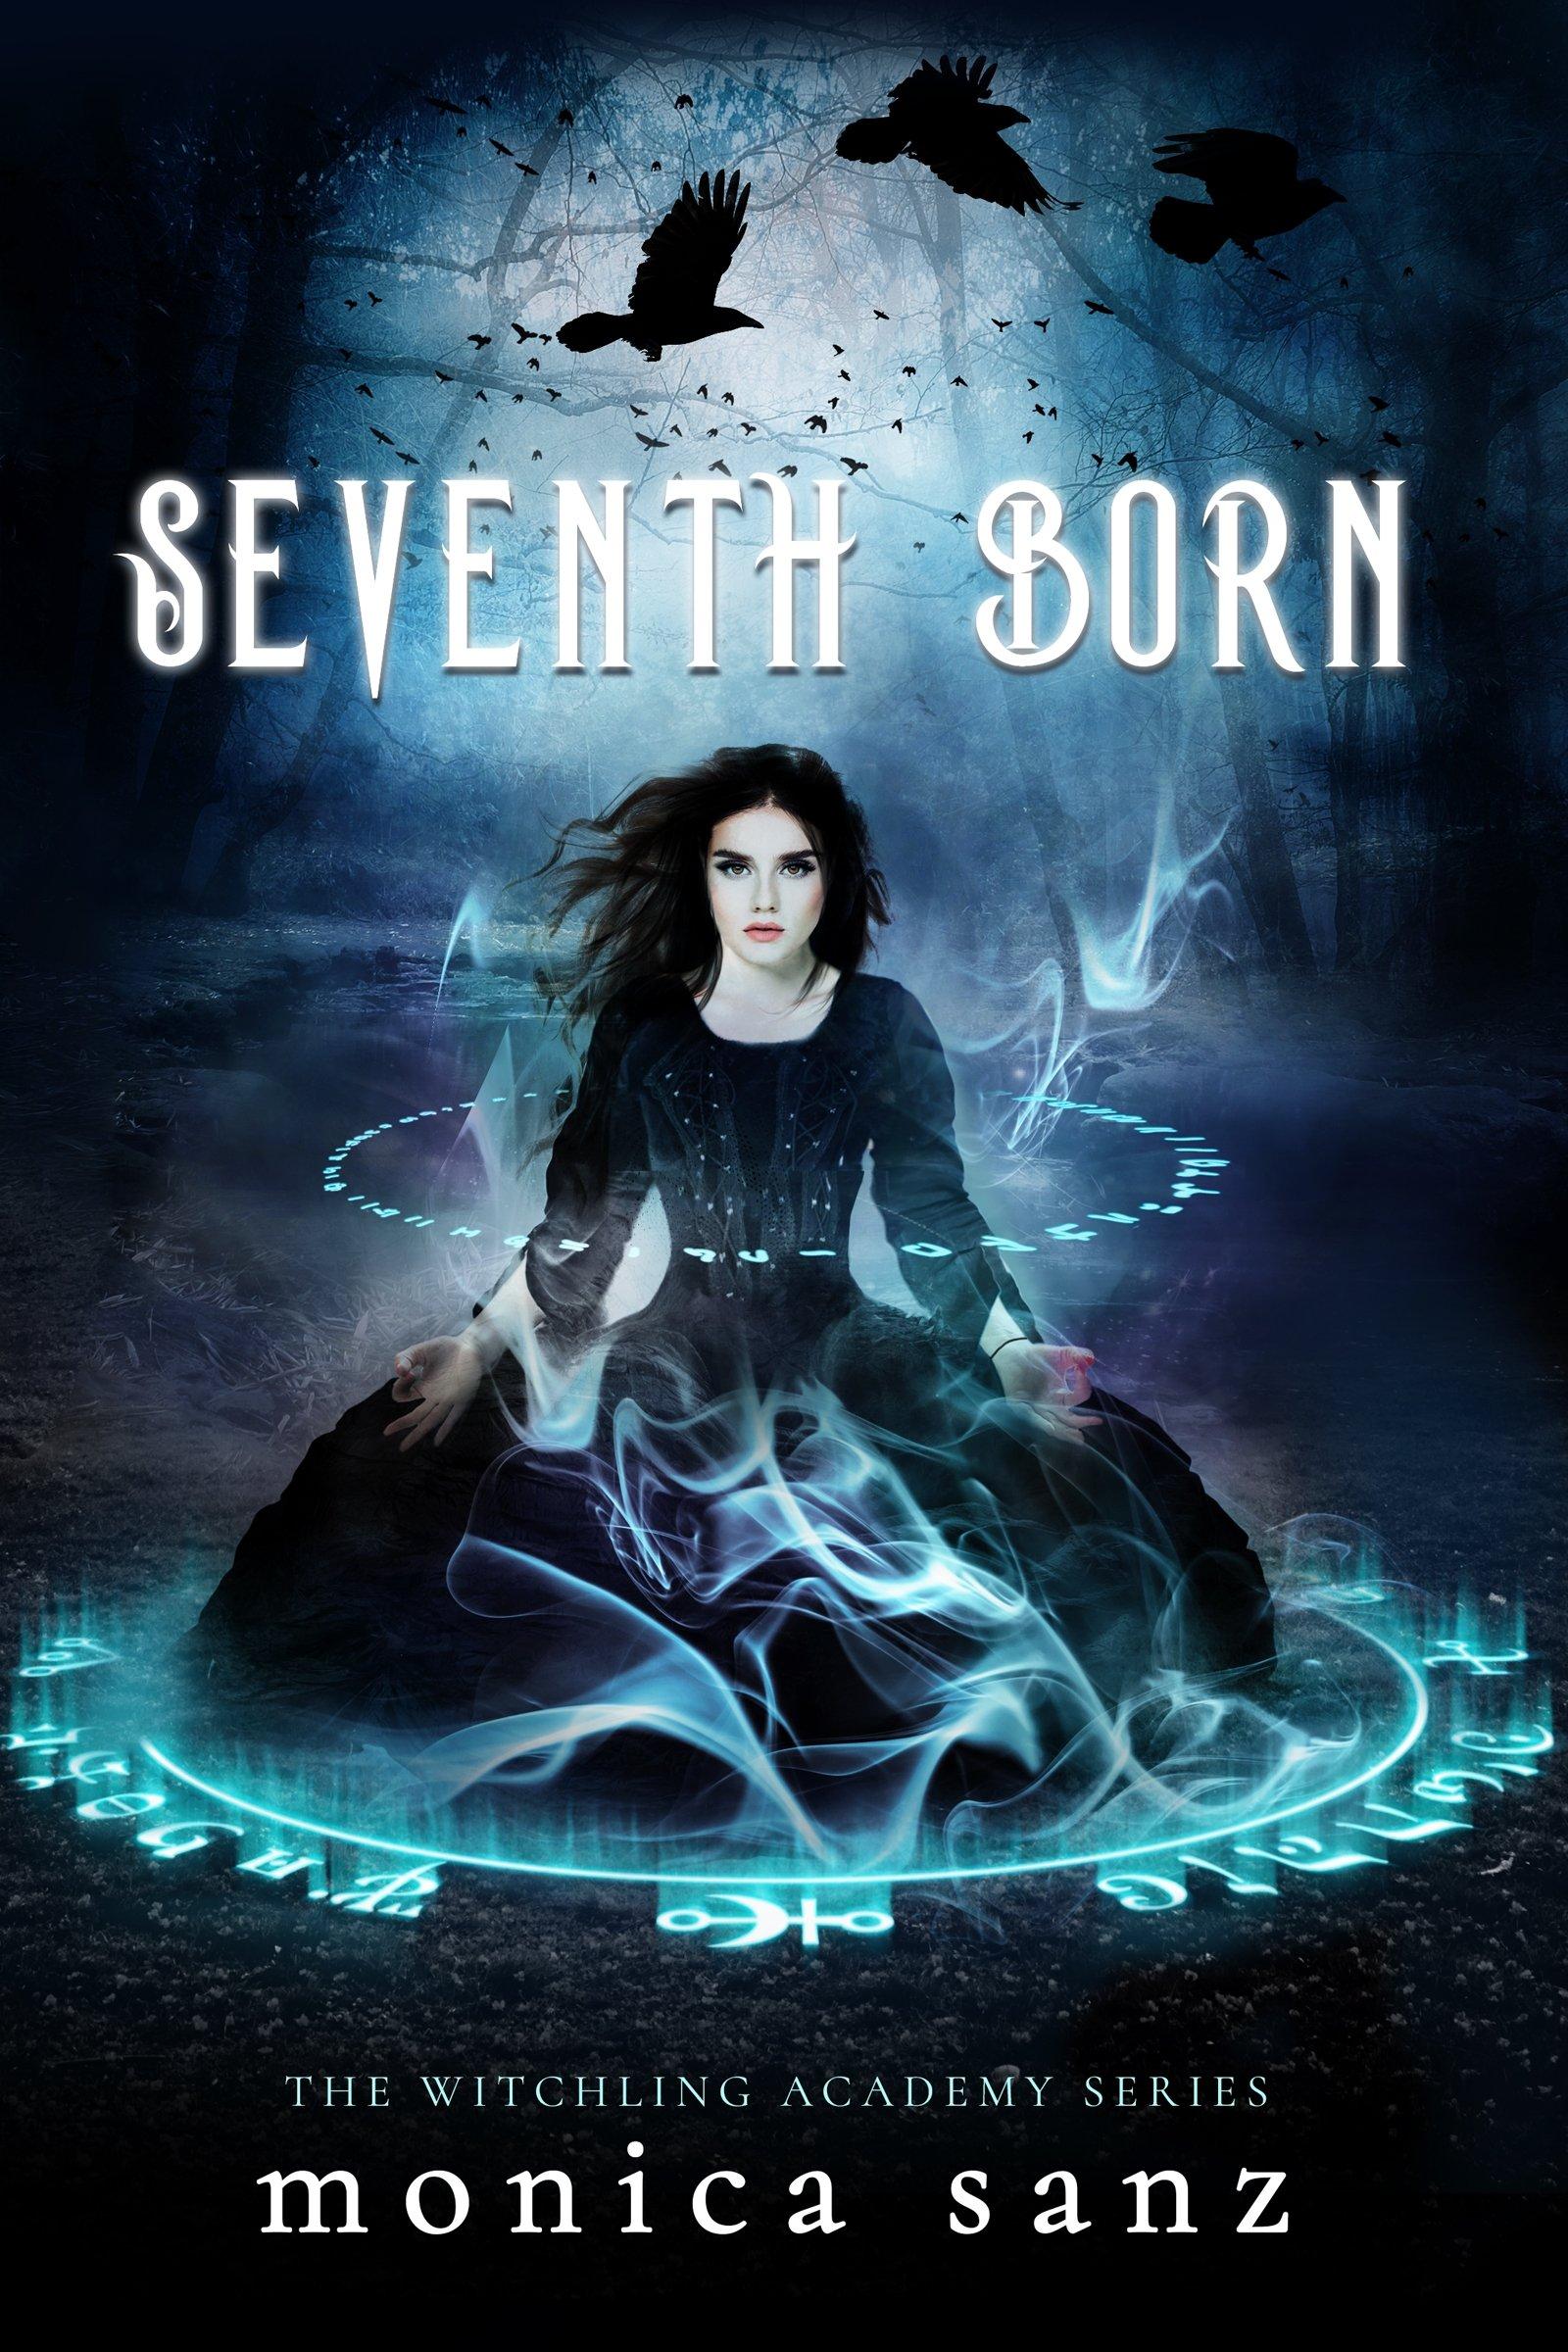 Amazon.com: Seventh Born (The Witchling Academy) (9781640631922): Monica  Sanz: Books